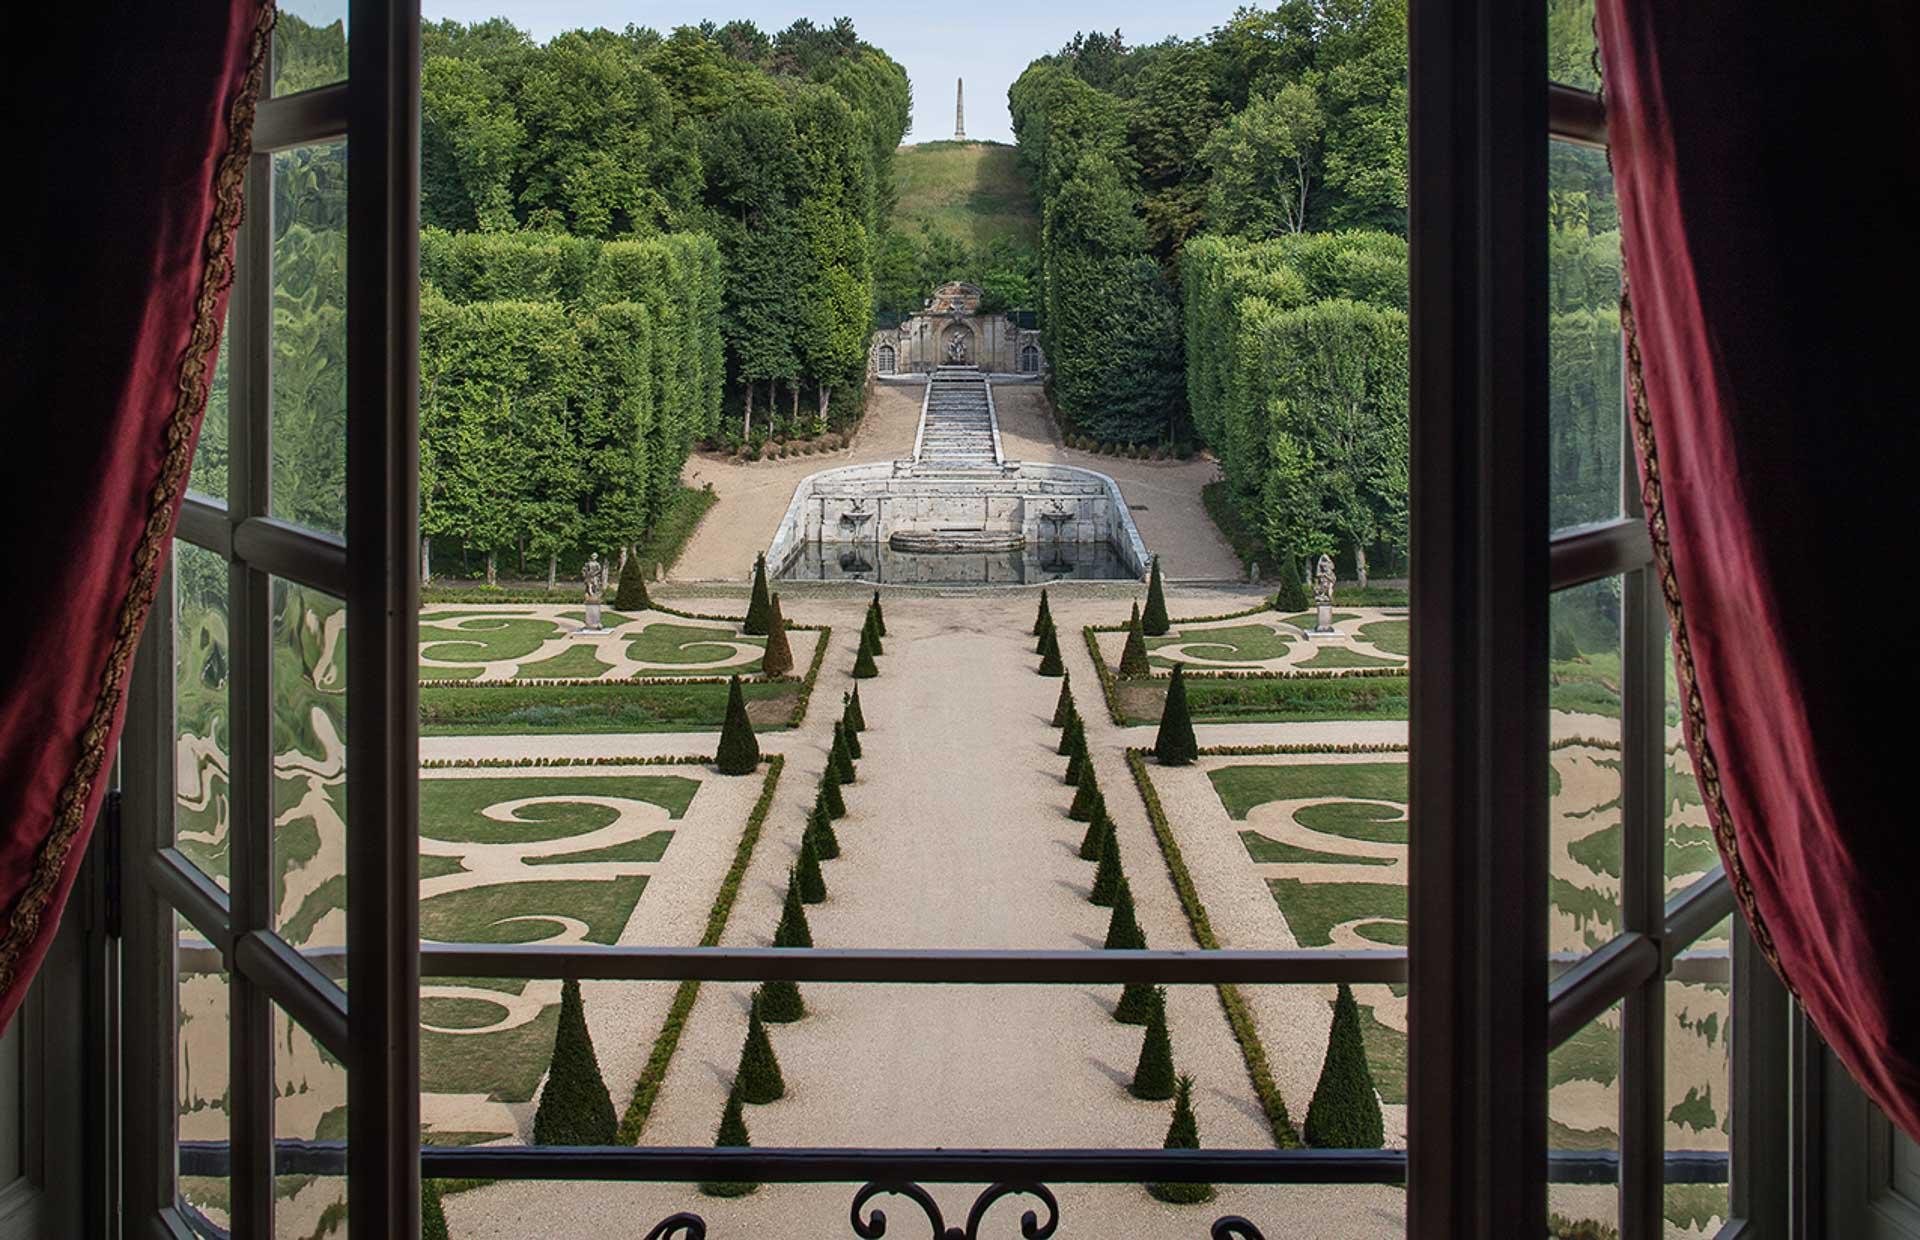 best view to park french garden parterre chateau france paris luxury travel accommodation exclusive retal event venue